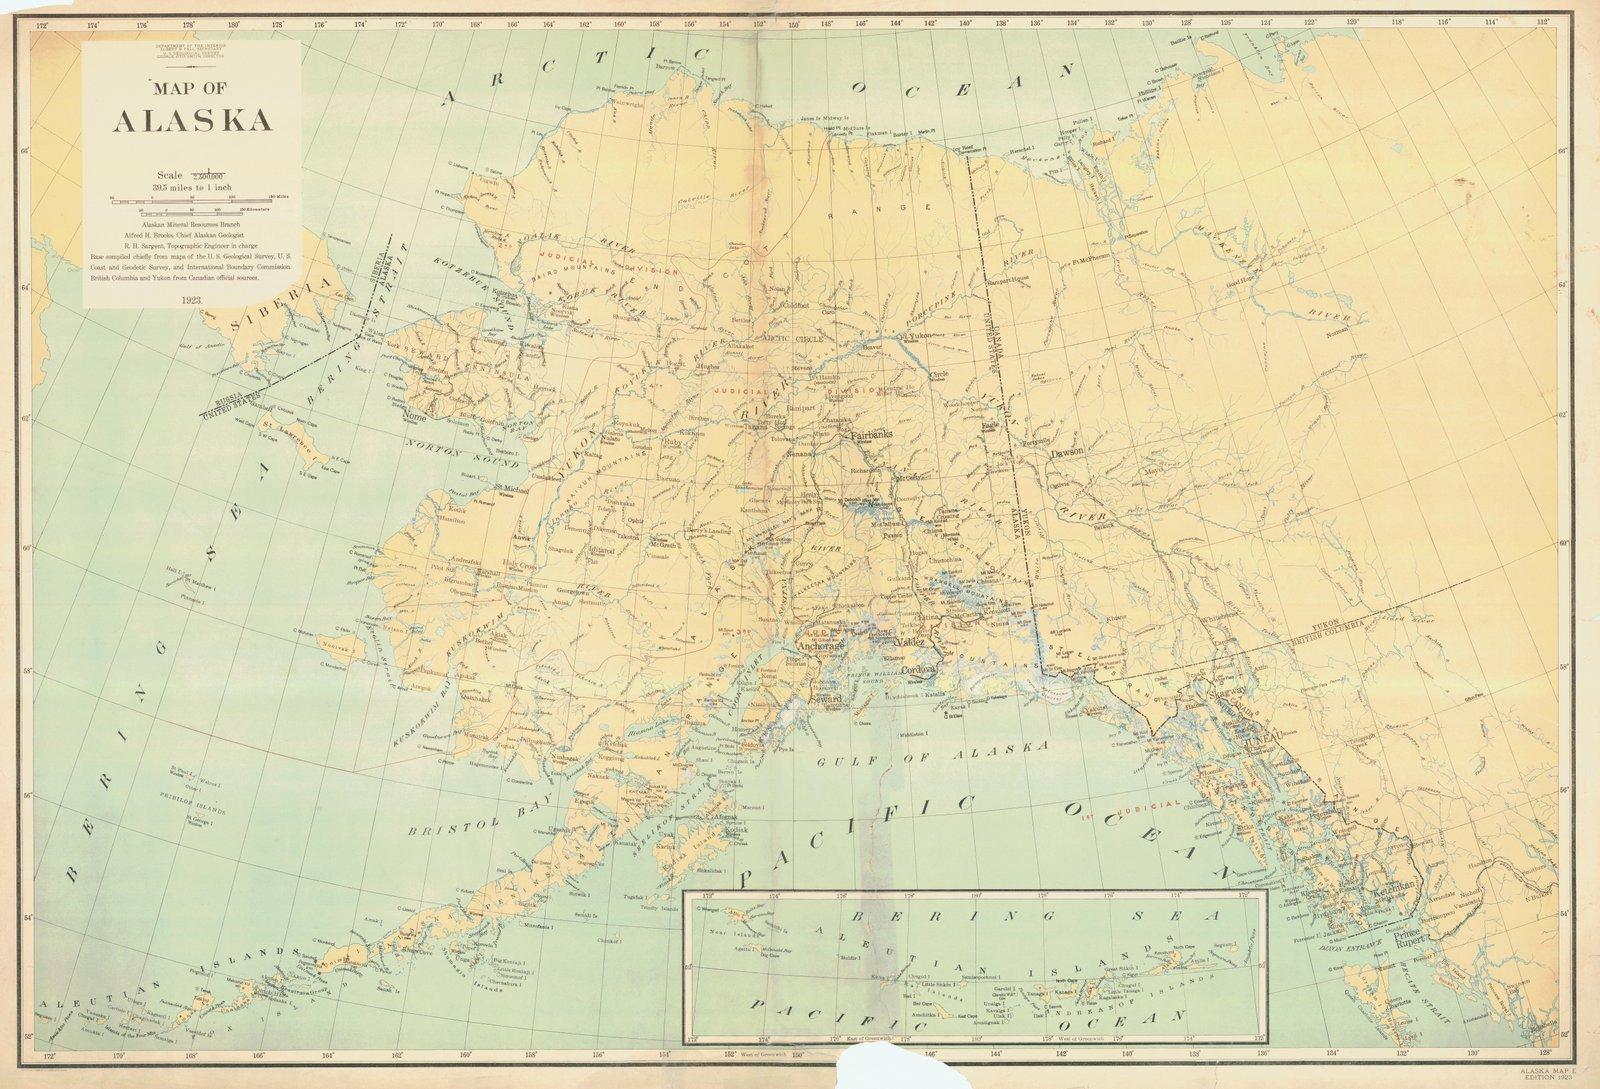 1923 Cartographic | Historical Map Of Alaska, AK |